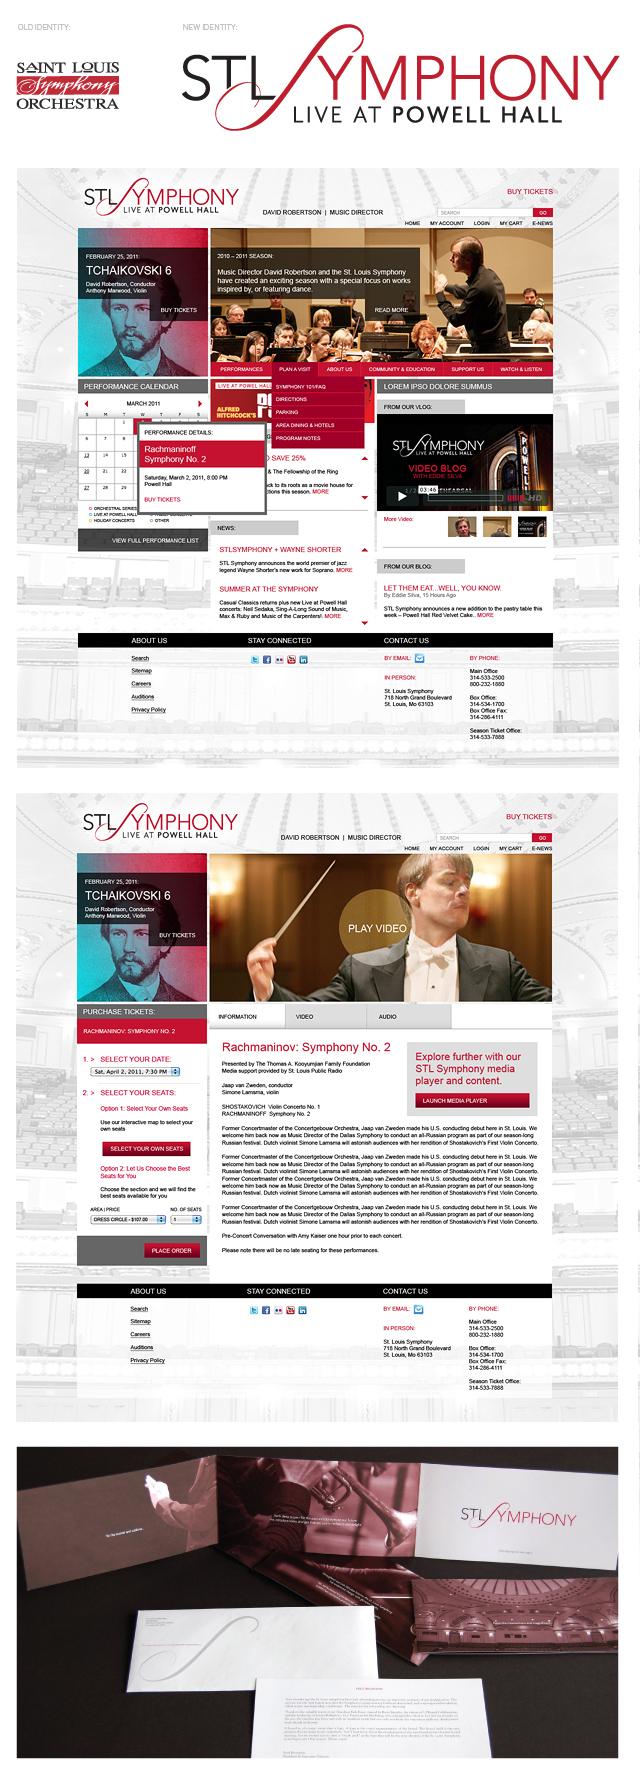 STL Symphony Brandumentary